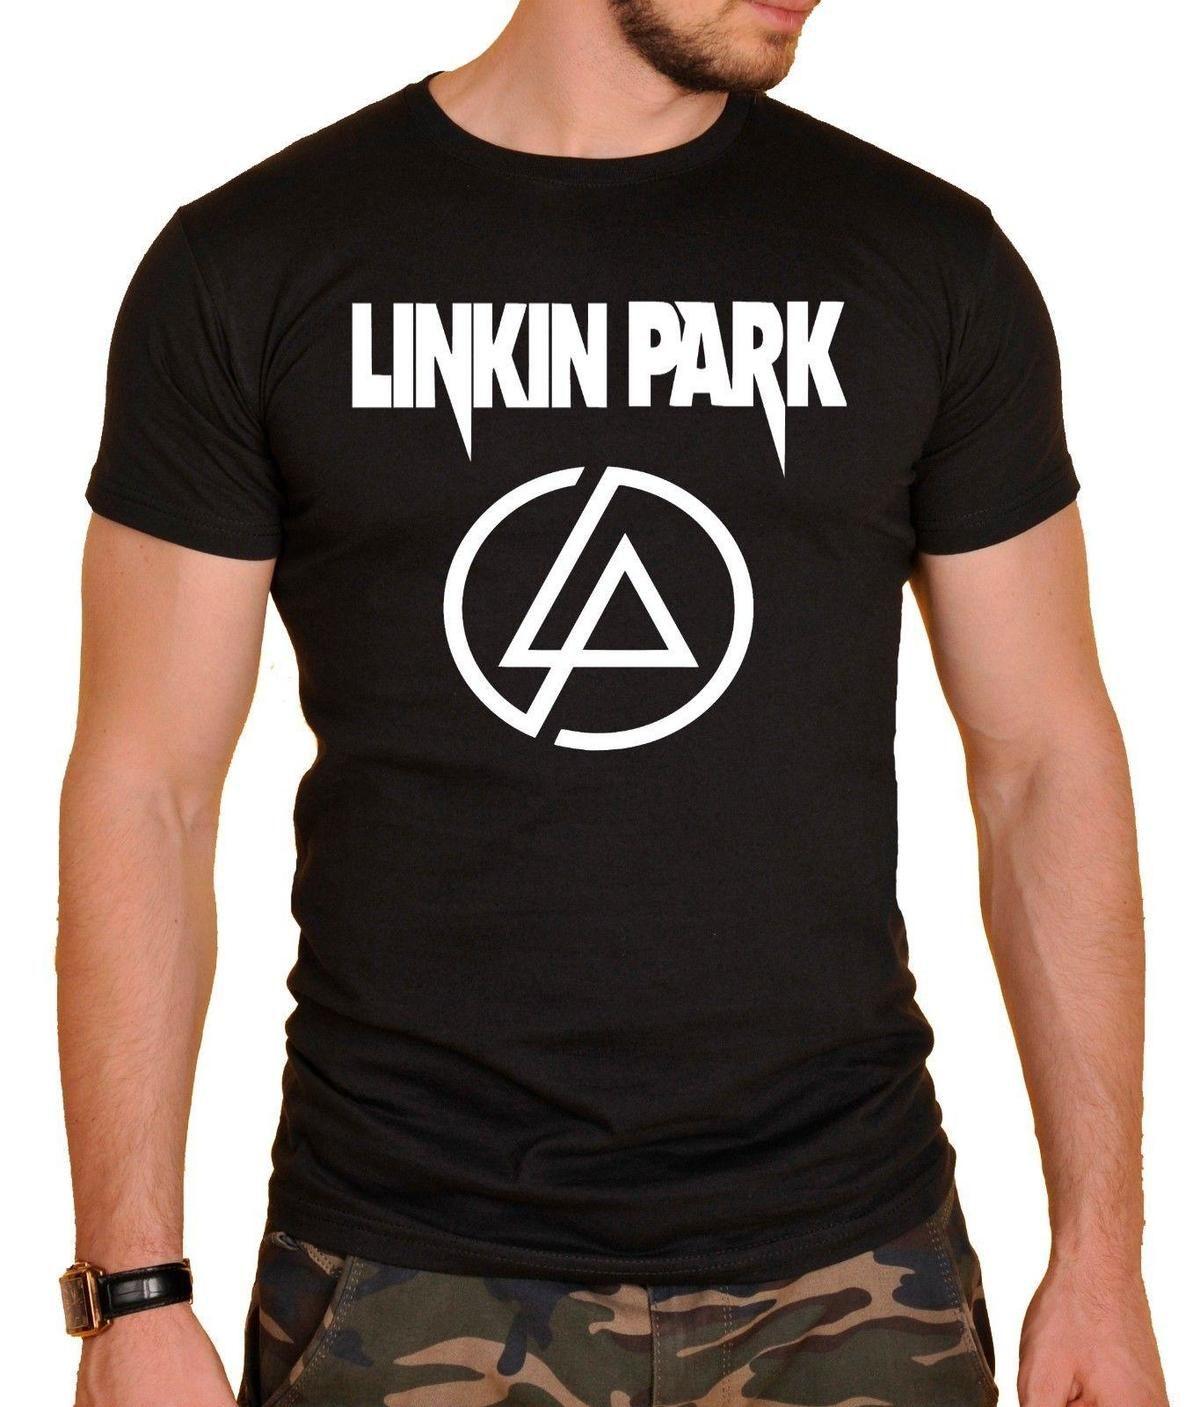 Linkin Park T Shirt 2019 Coolmine Community School